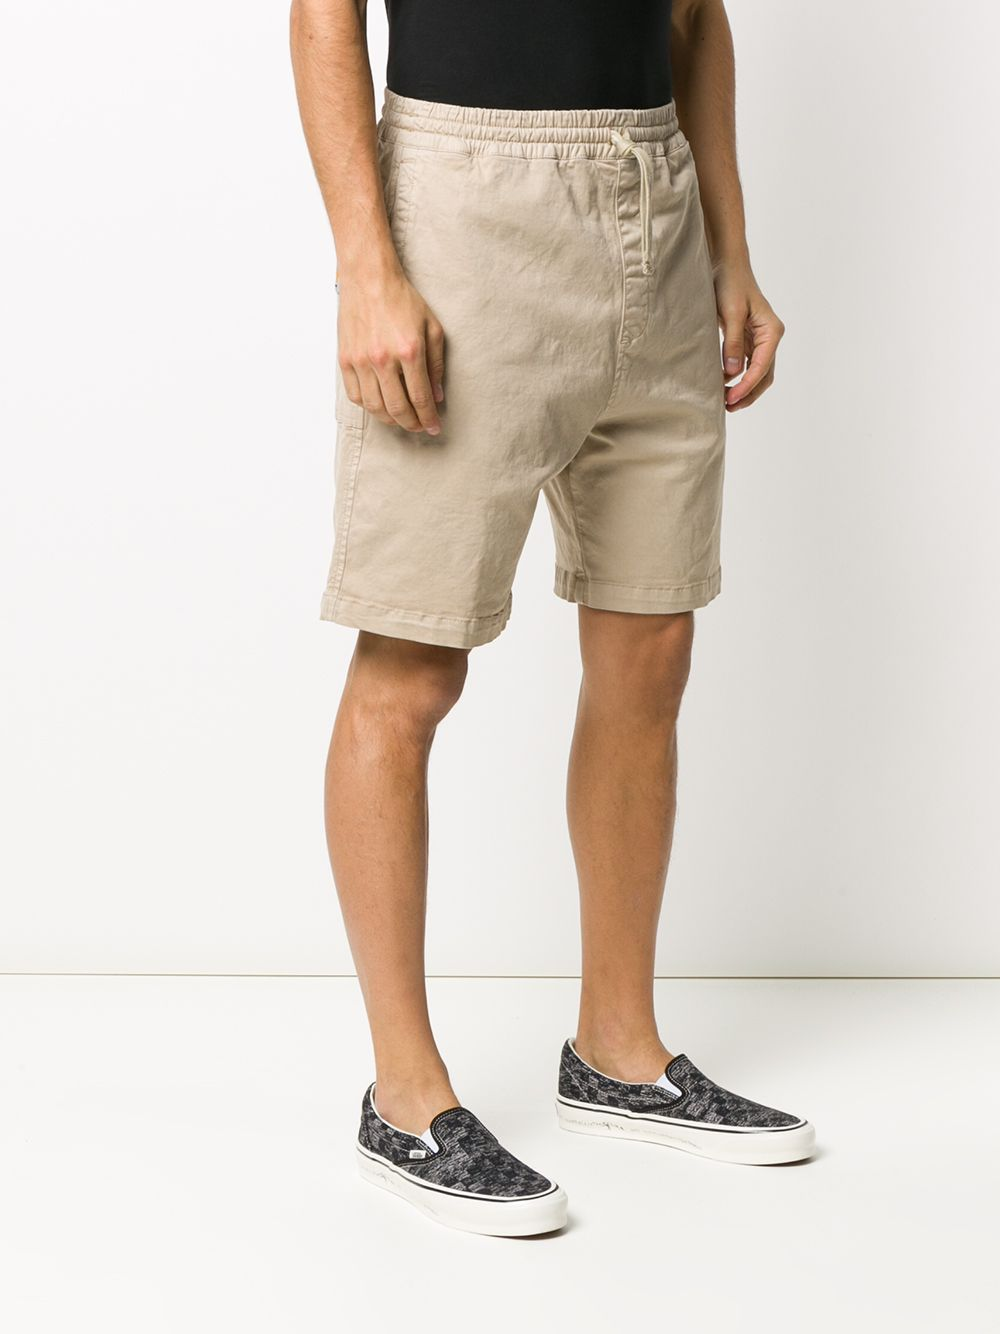 LOWTON SHORTS CARHARTT WIP | Shorts | I026518G1.GD